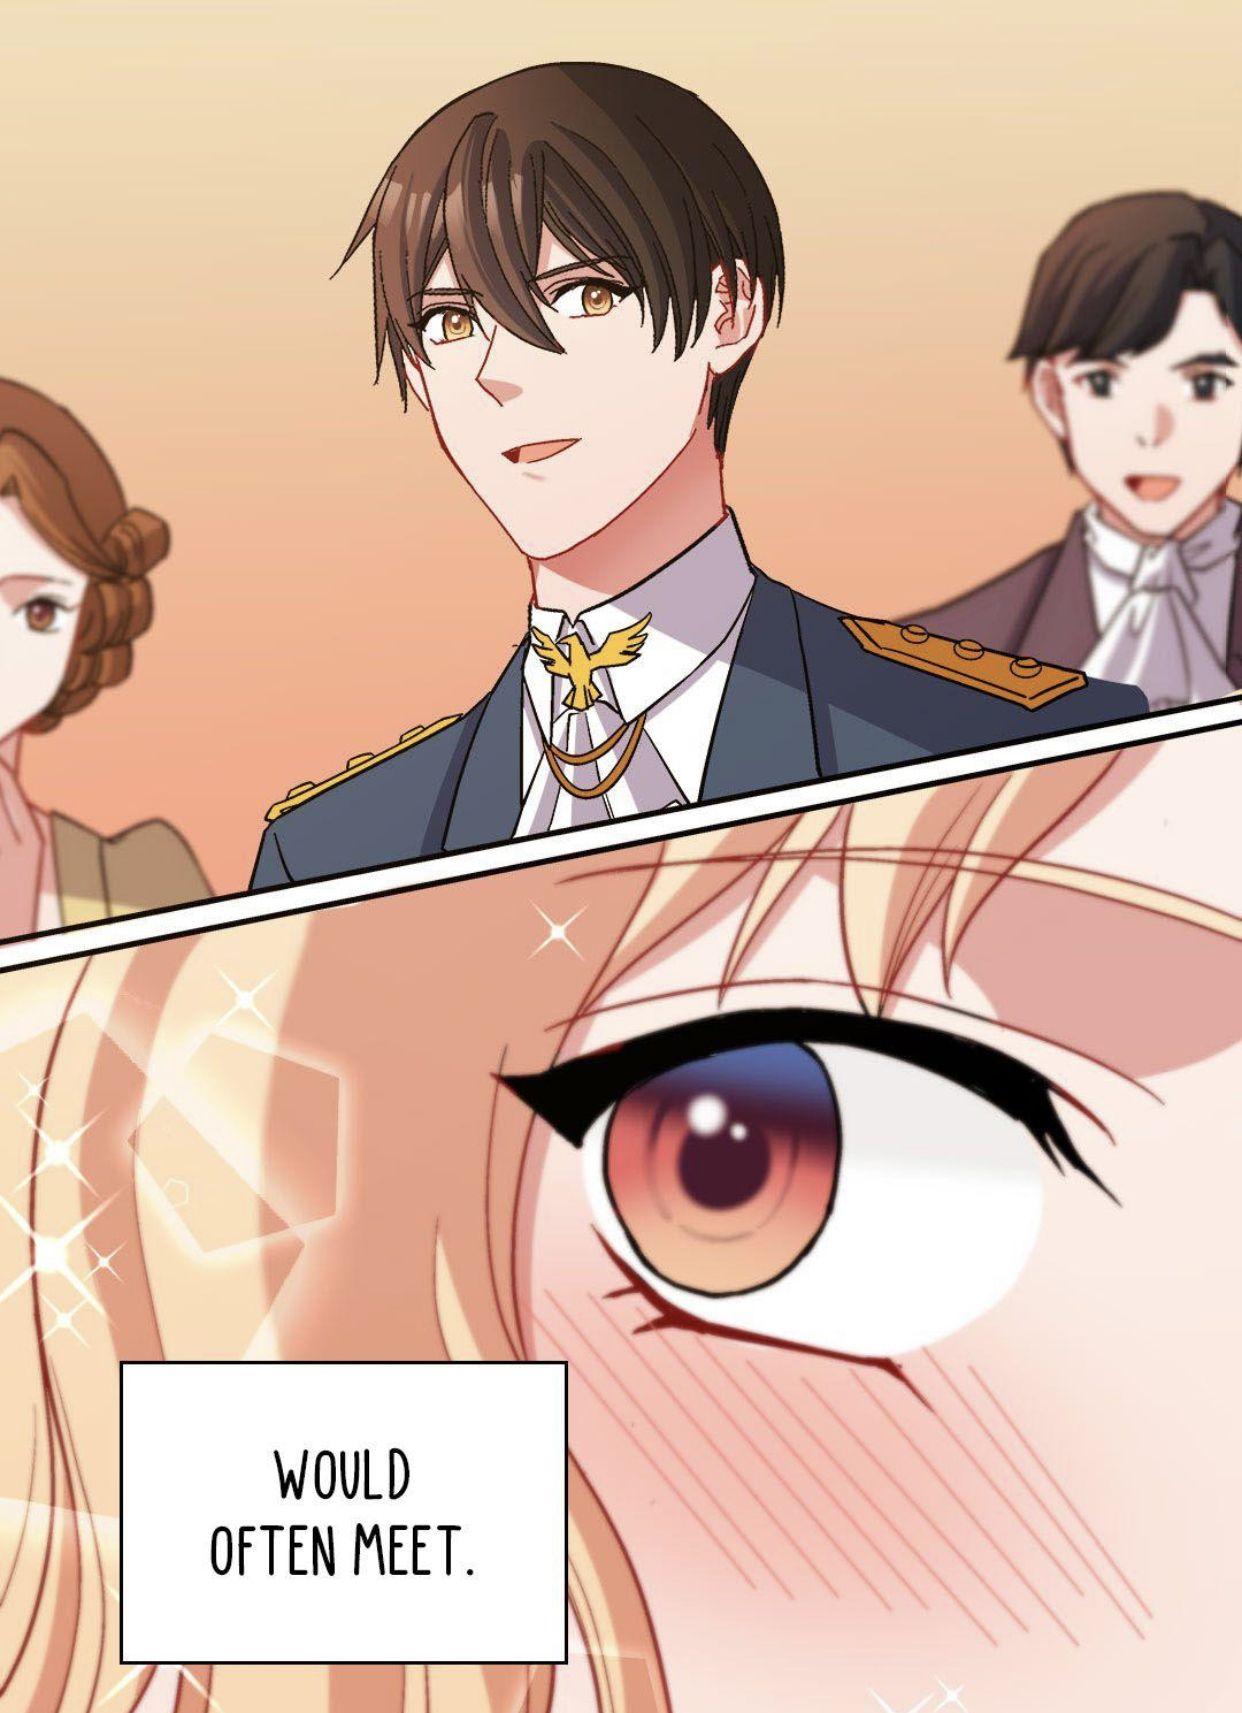 Pin oleh Animemangaluver di The Justice Of Villainous